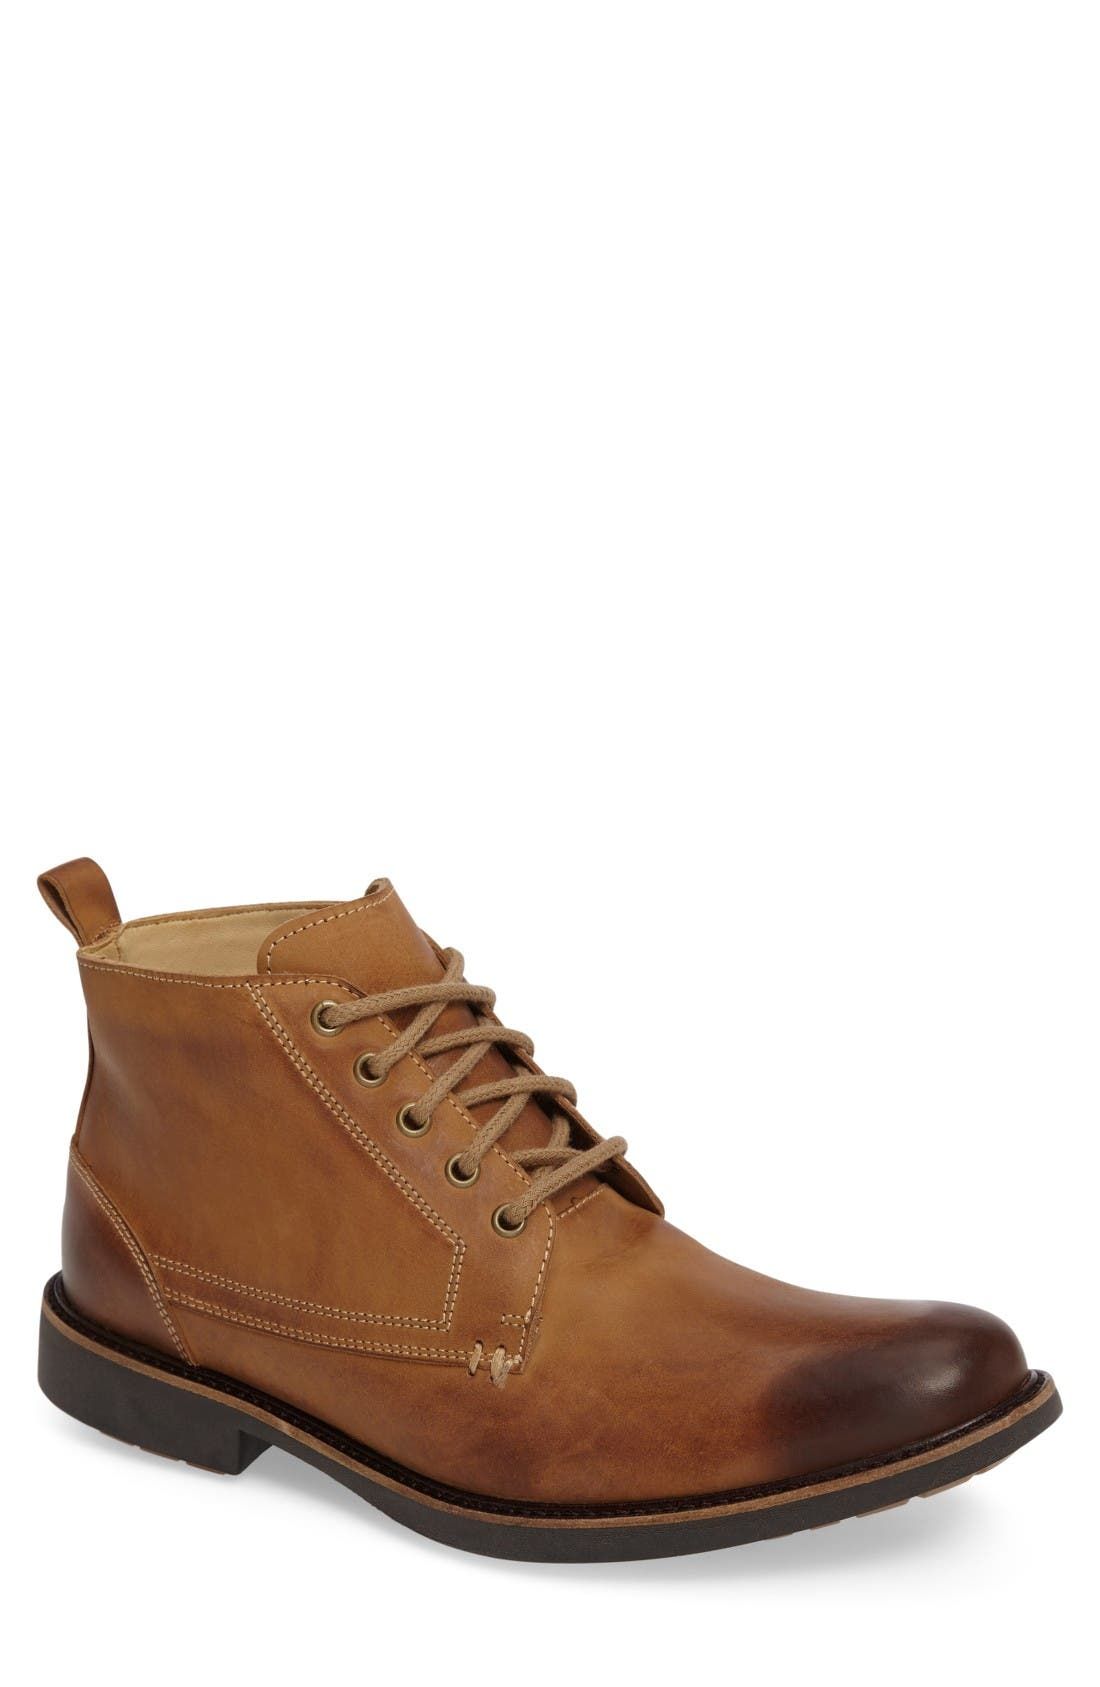 ANATOMIC & CO 'Pedras' Boot